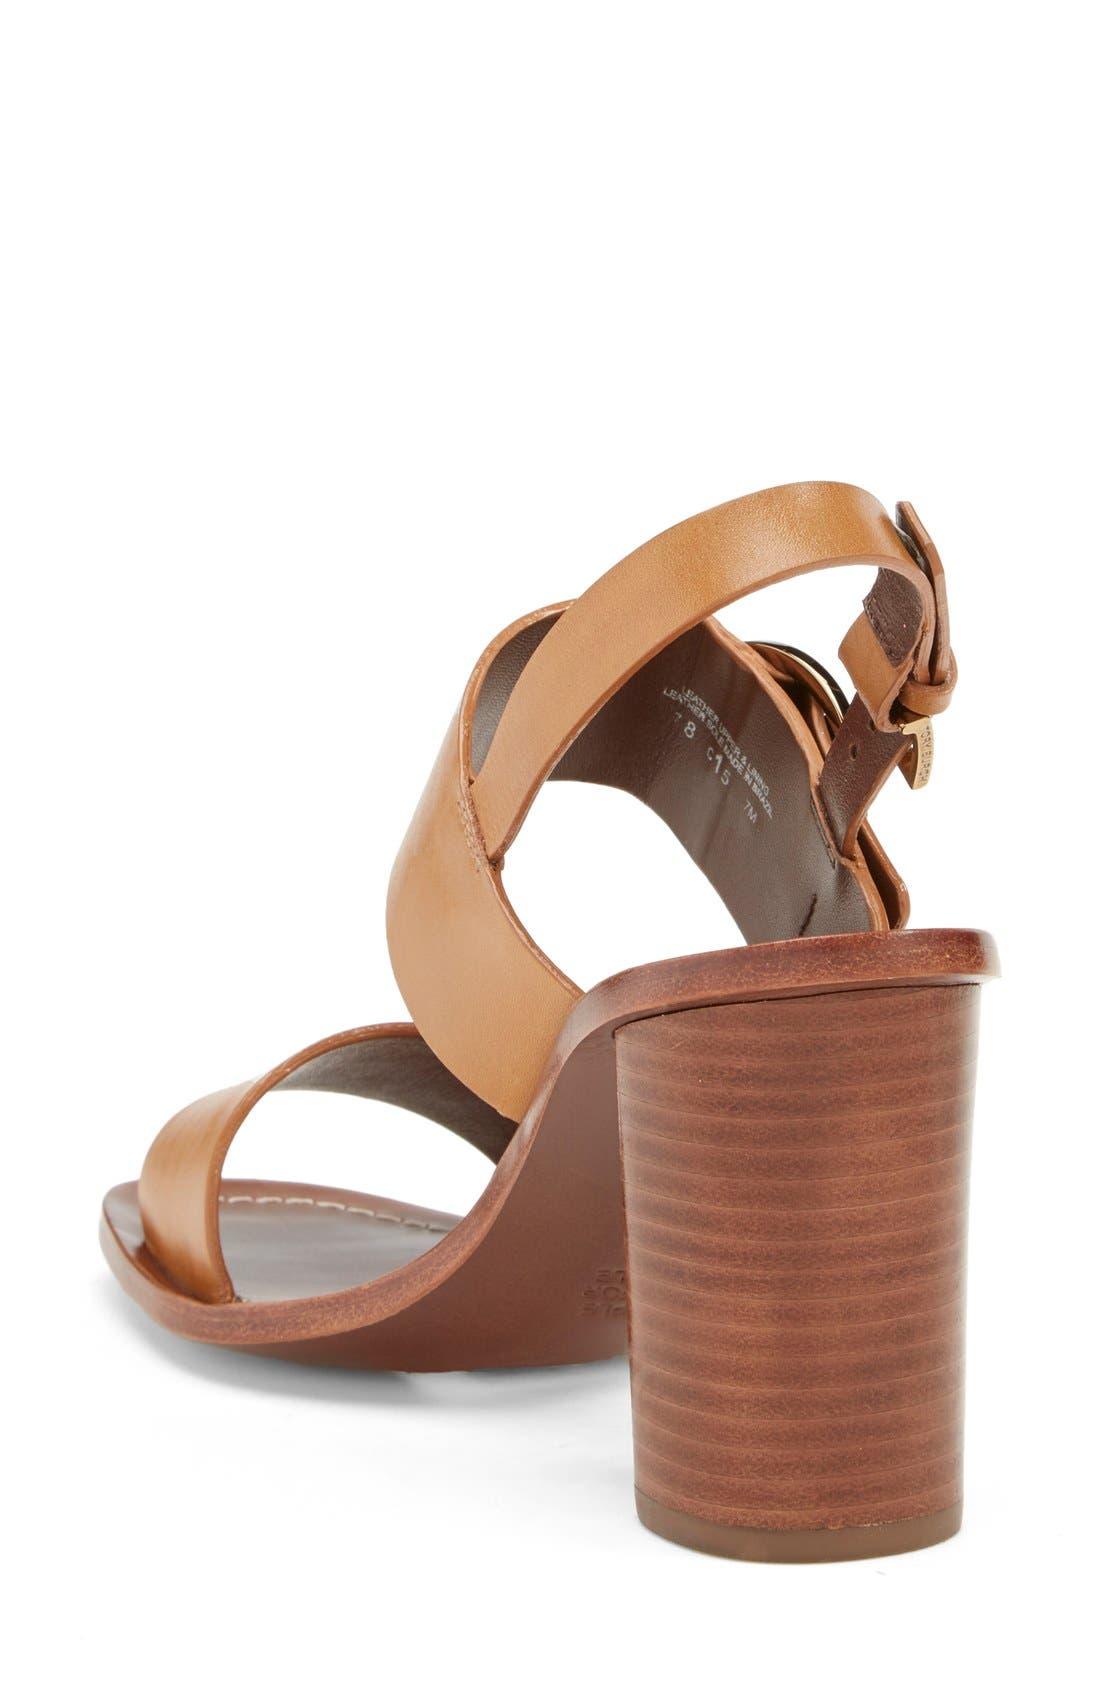 Alternate Image 2  - Tory Burch 'Thames' Sandal (Women)